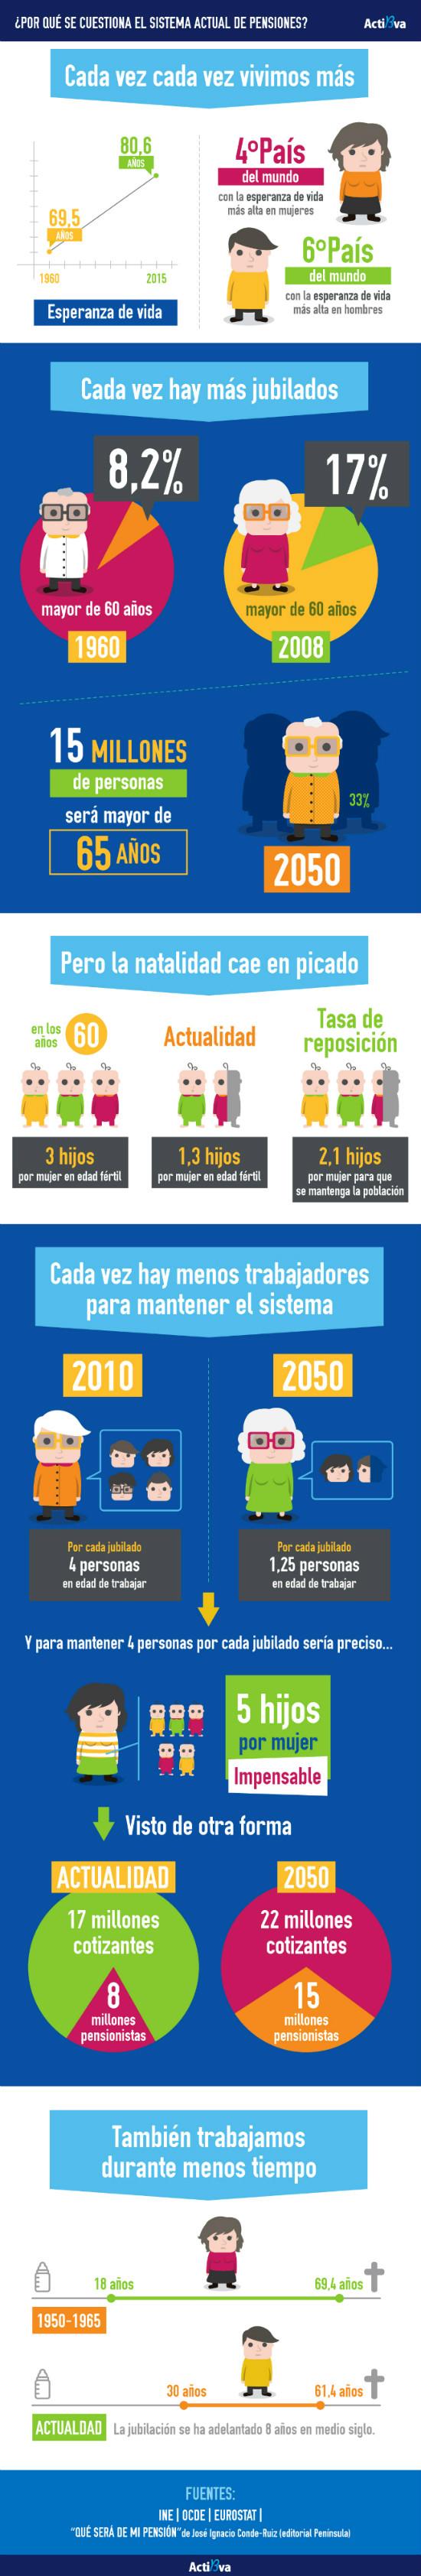 wpid-sistema-pensiones-infografia.jpg